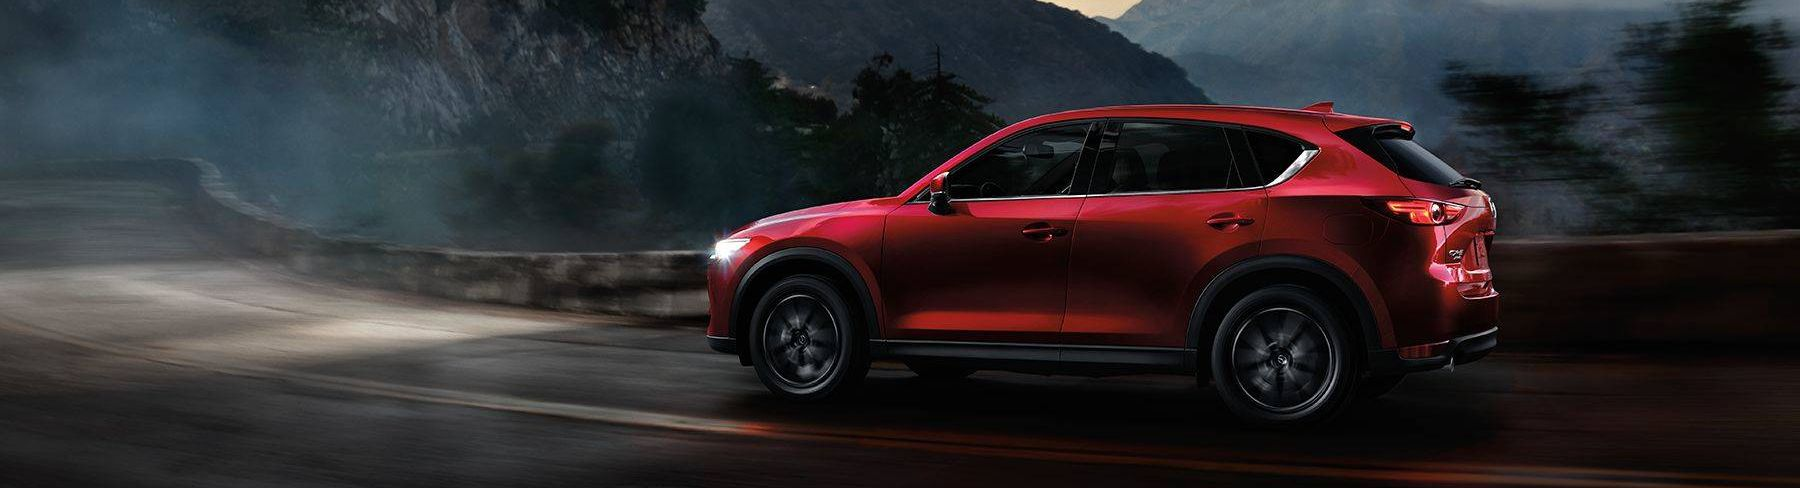 2018 Mazda CX-5 for Sale in San Antonio, TX